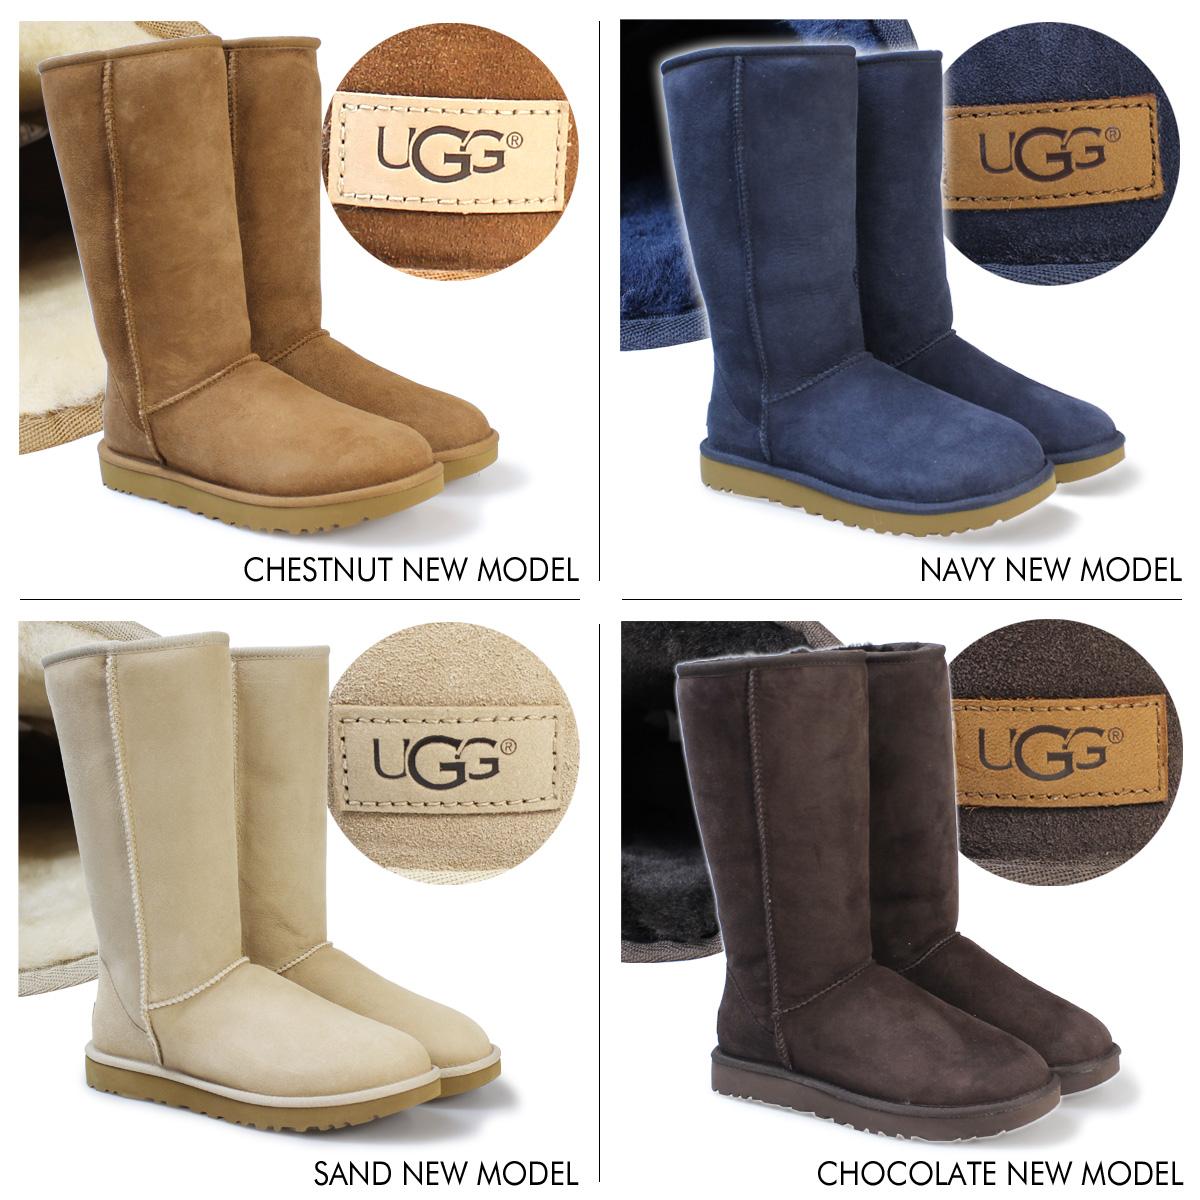 UGG Ugg Classic Tall Sheepskin boots WOMENS CLASSIC TALL 5815 Sheepskin women's